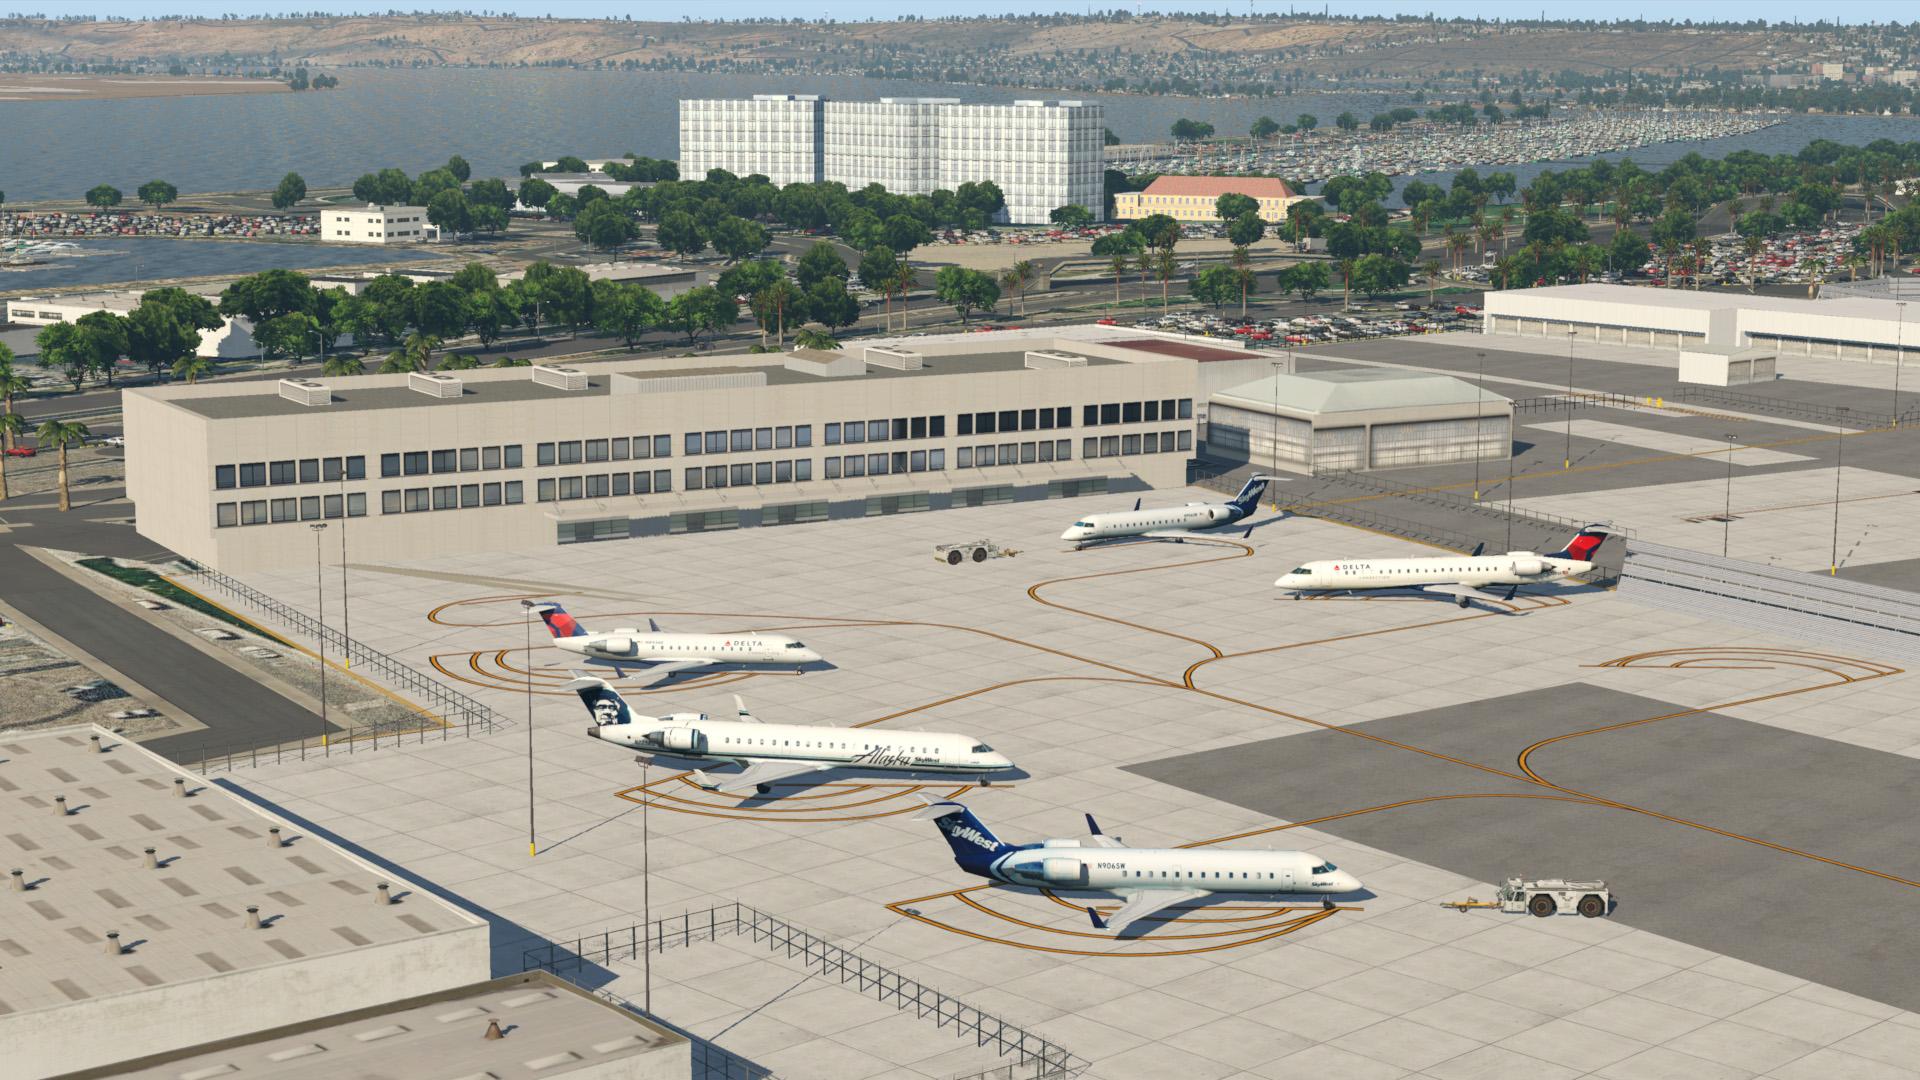 KSAN - San Diego International - Scenery Packages (v11,v 10